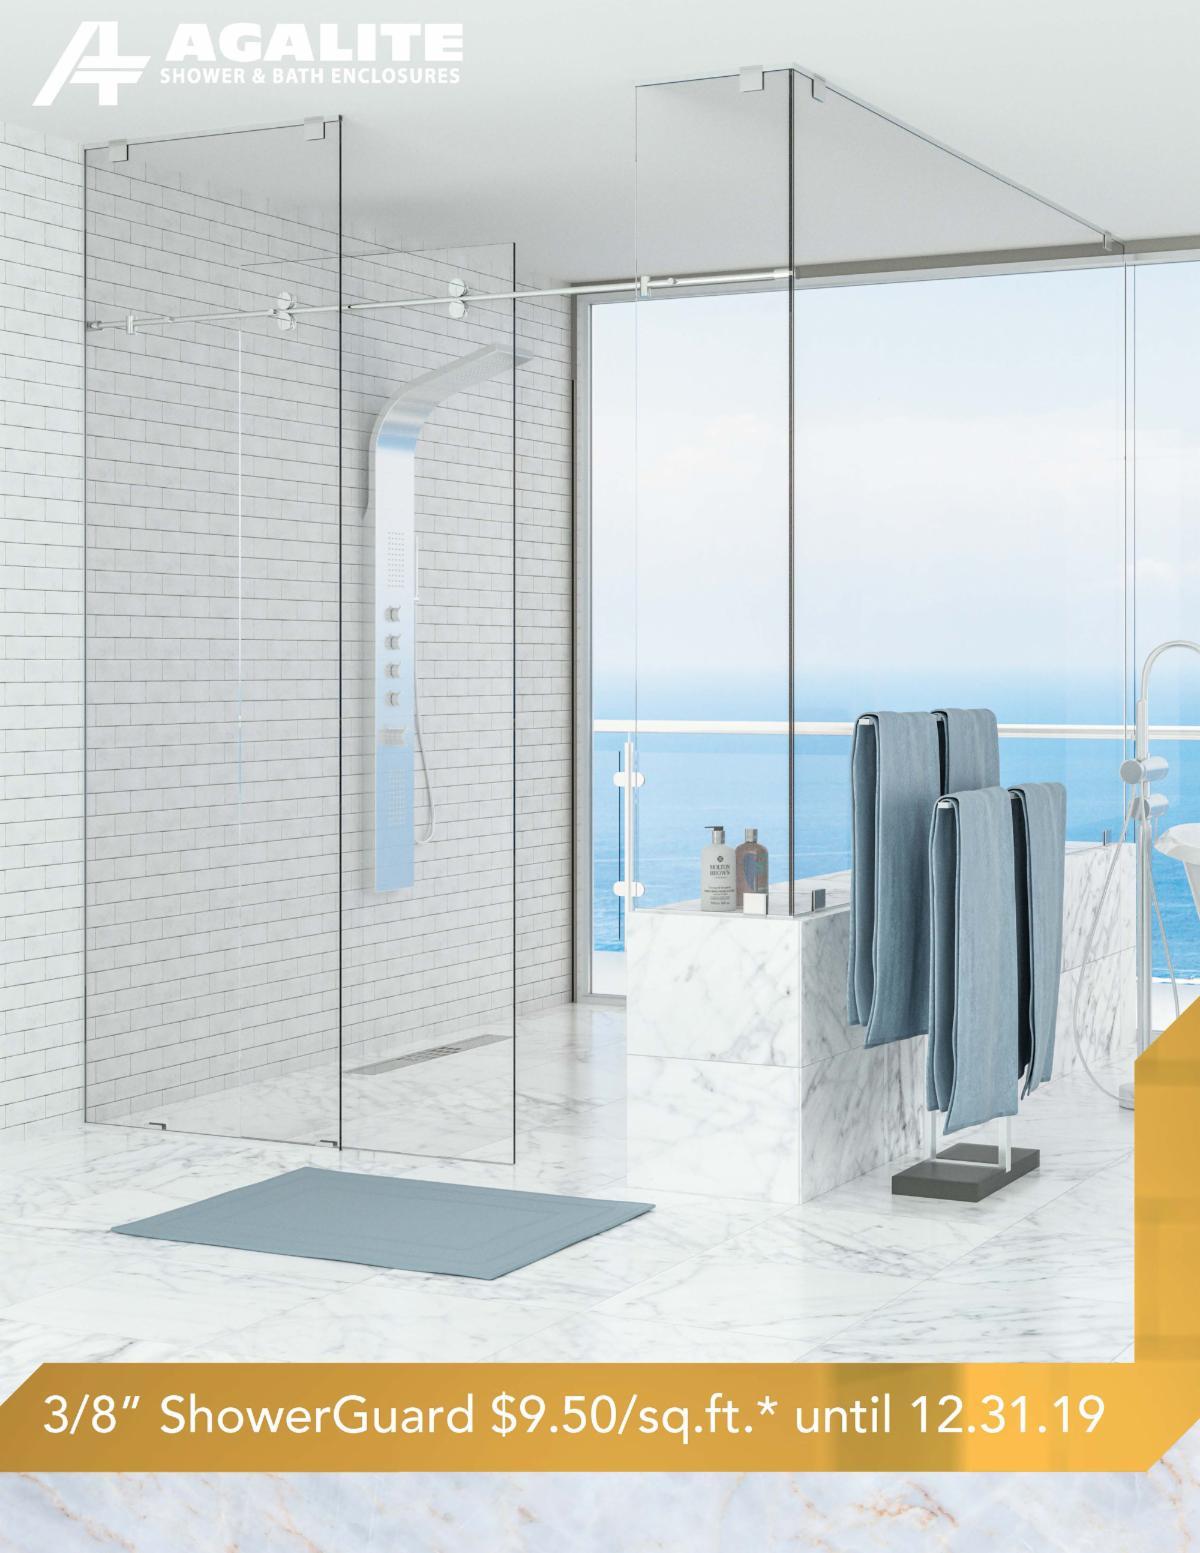 Agalite ShowerGuard Promo